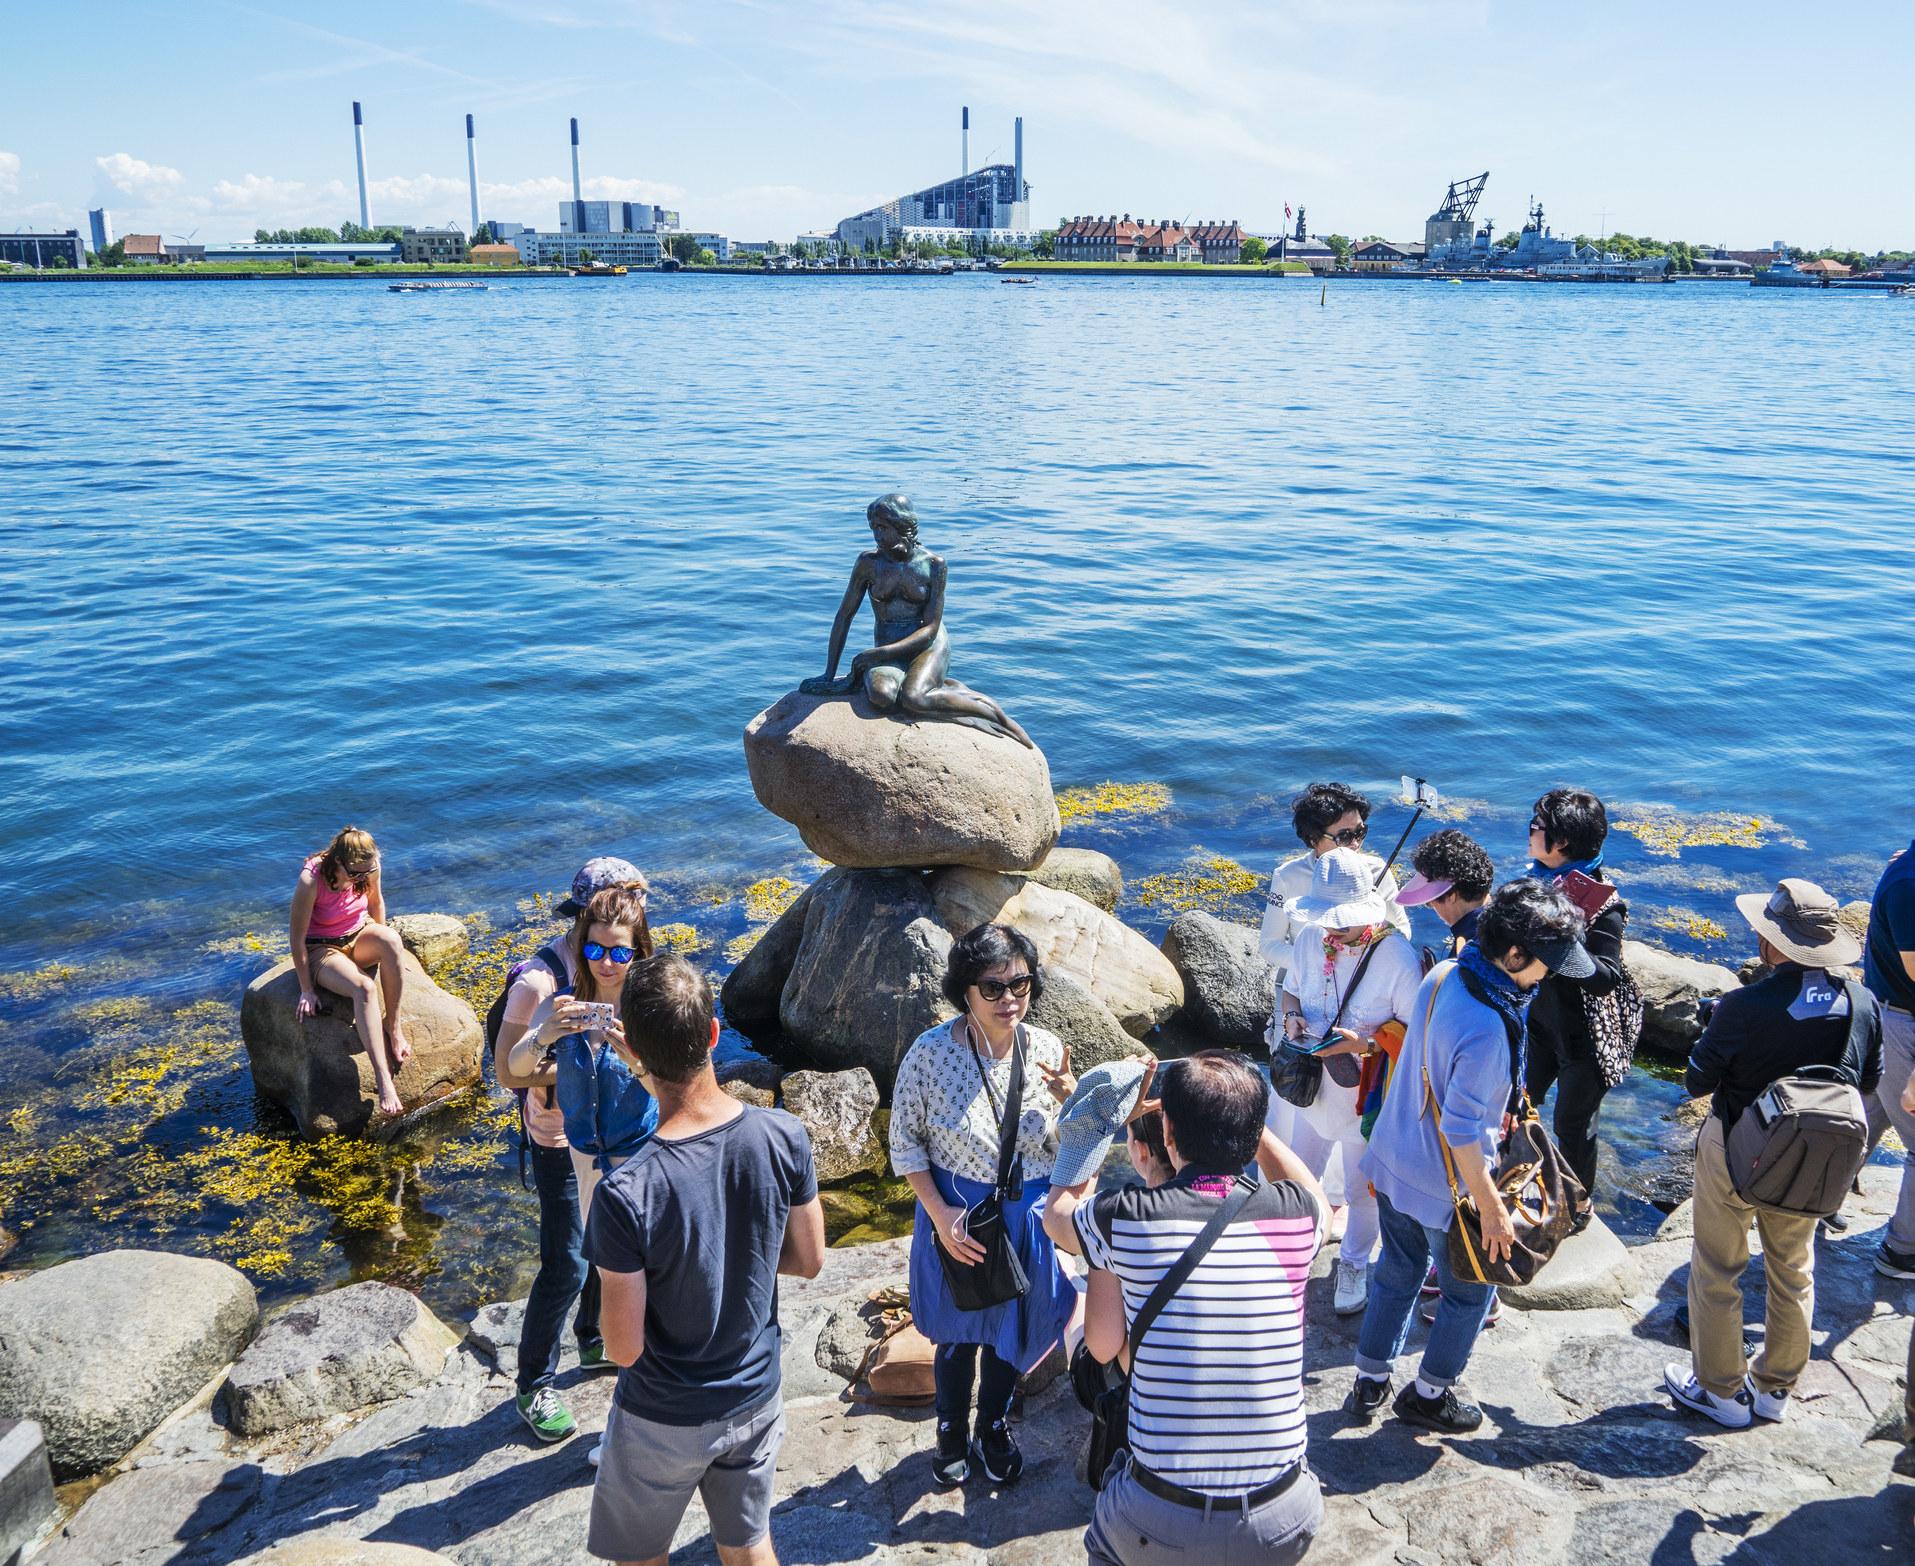 Tourists gathering around the Little Mermaid statue in Copenhagen